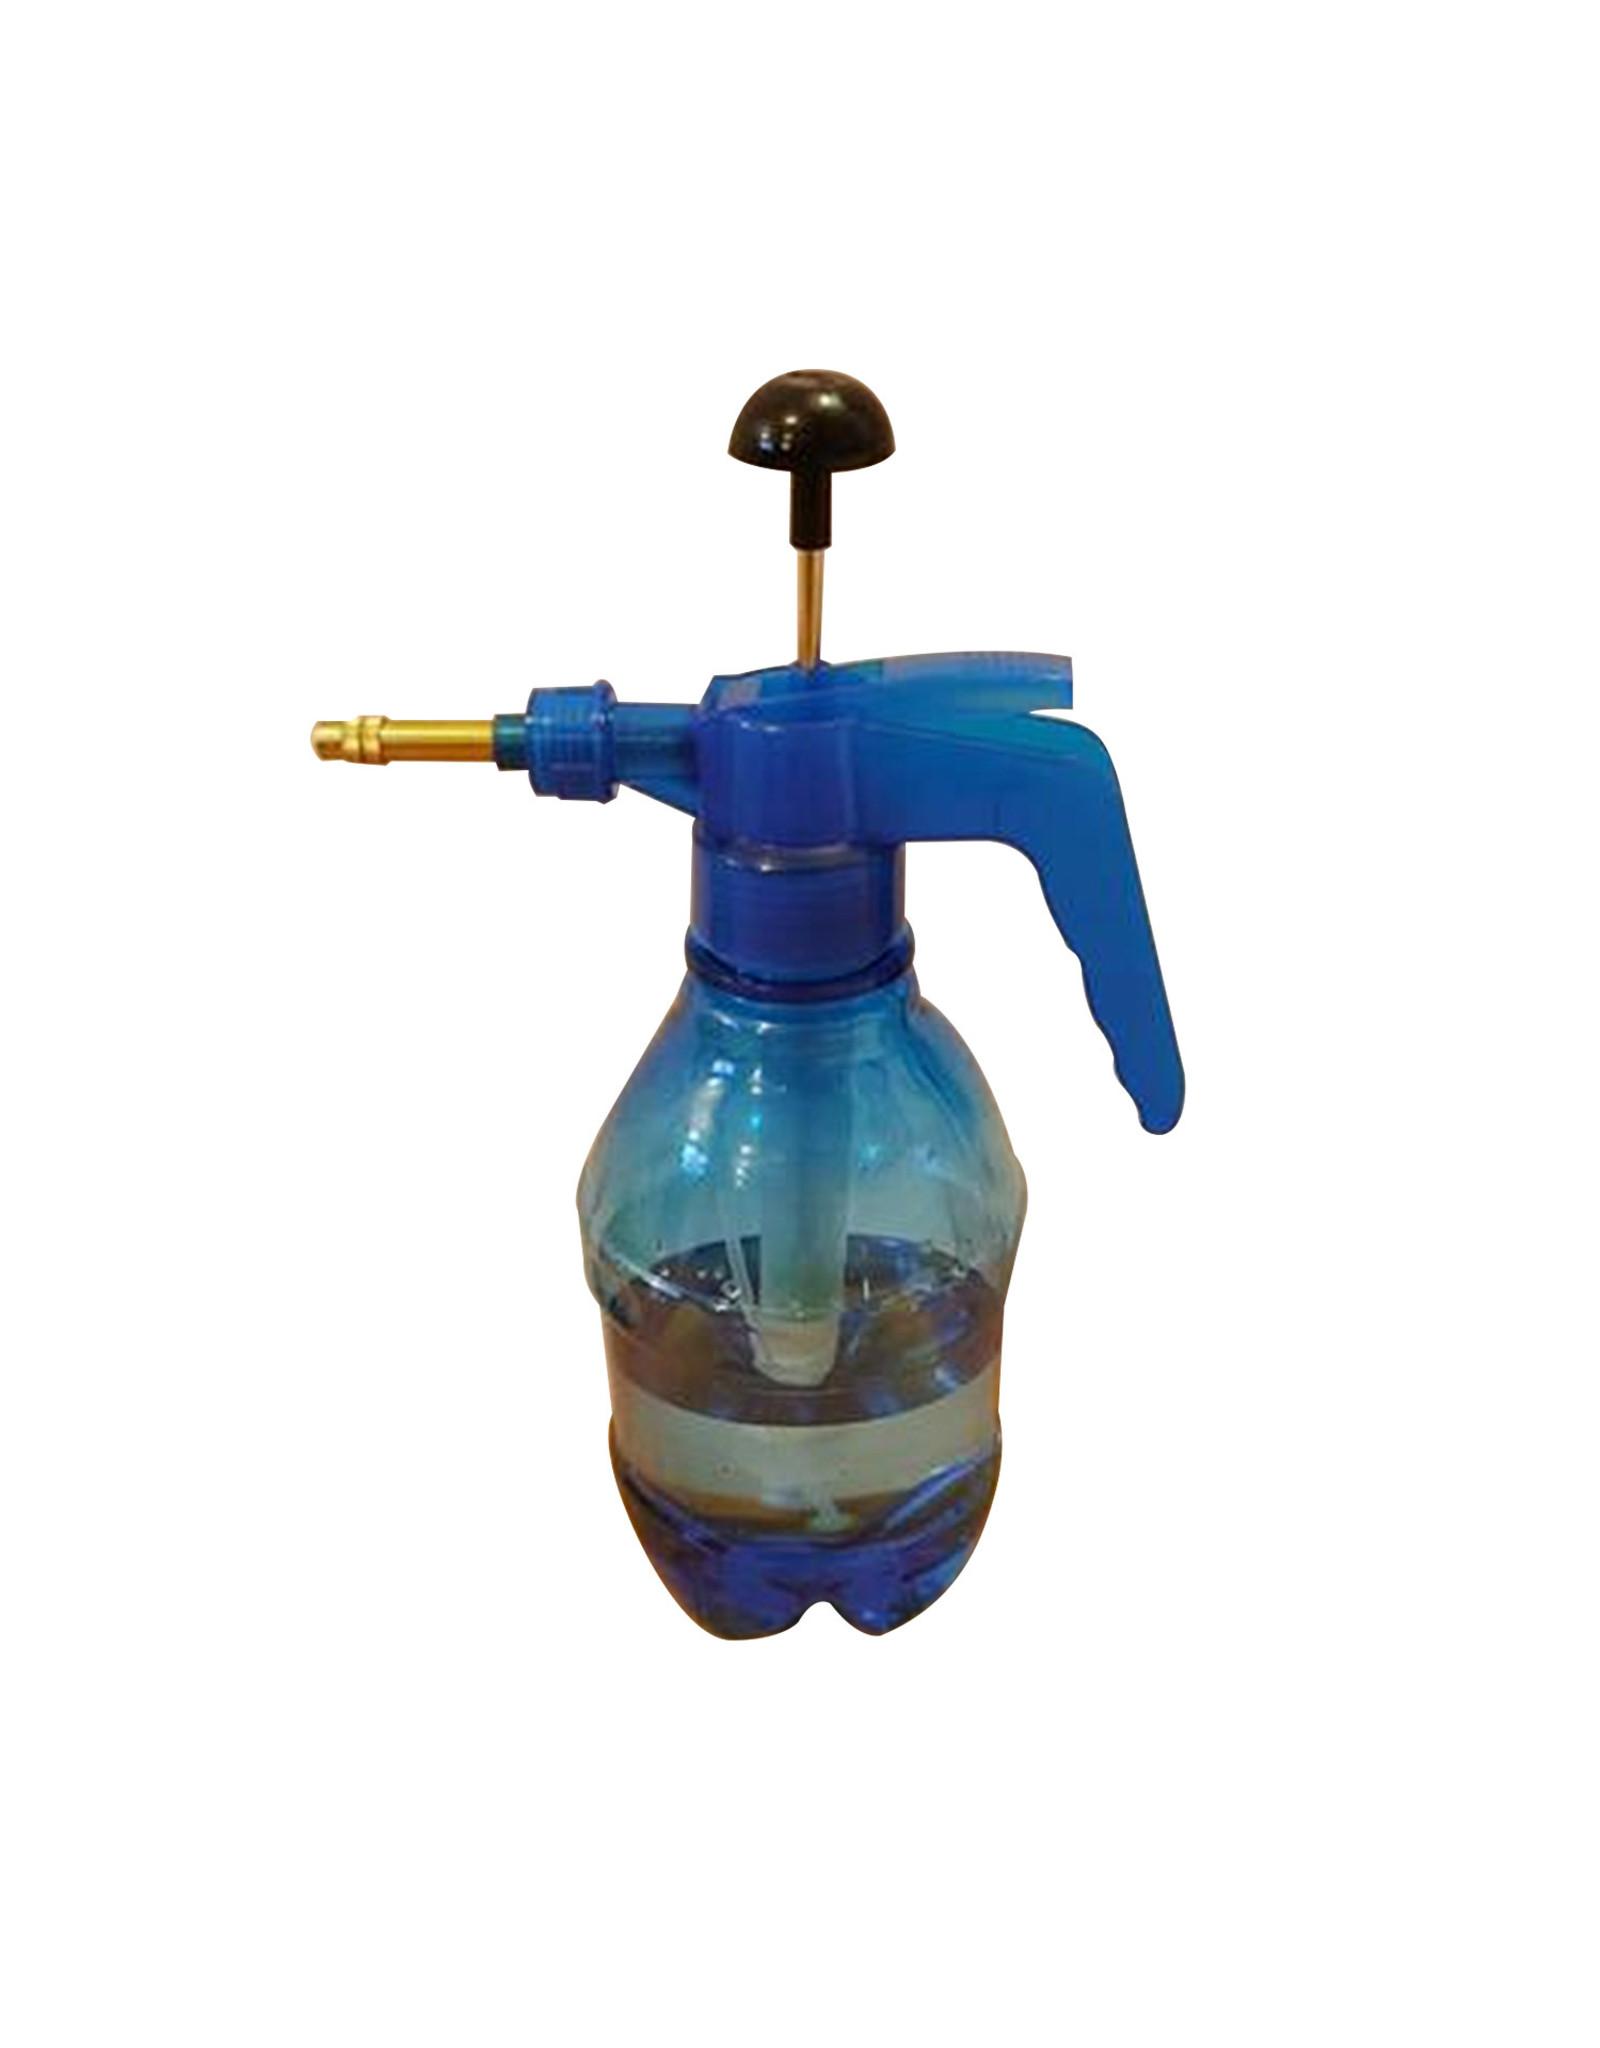 W.A.S.H. W.A.S.H. Pressure Sprayer - 1,5 liter - blue